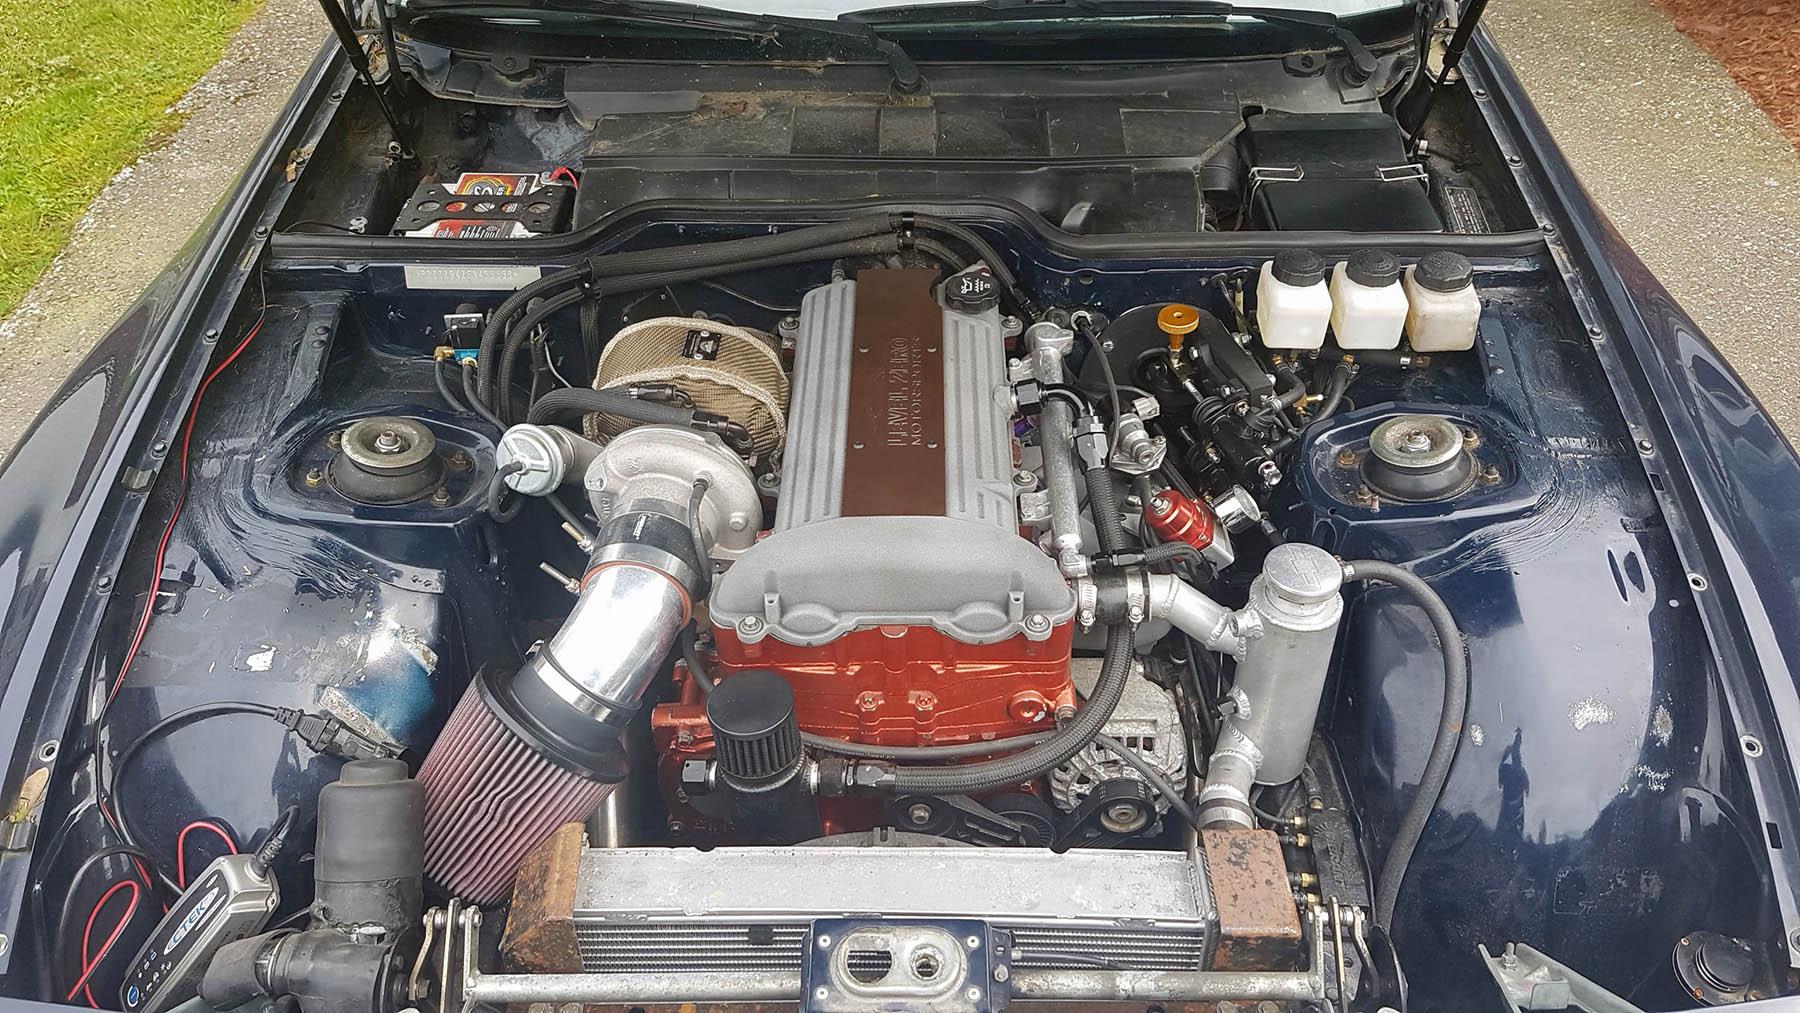 Porsche 944 With A Turbo 2 2 L Ecotec Inline Four Engine Swap Depot